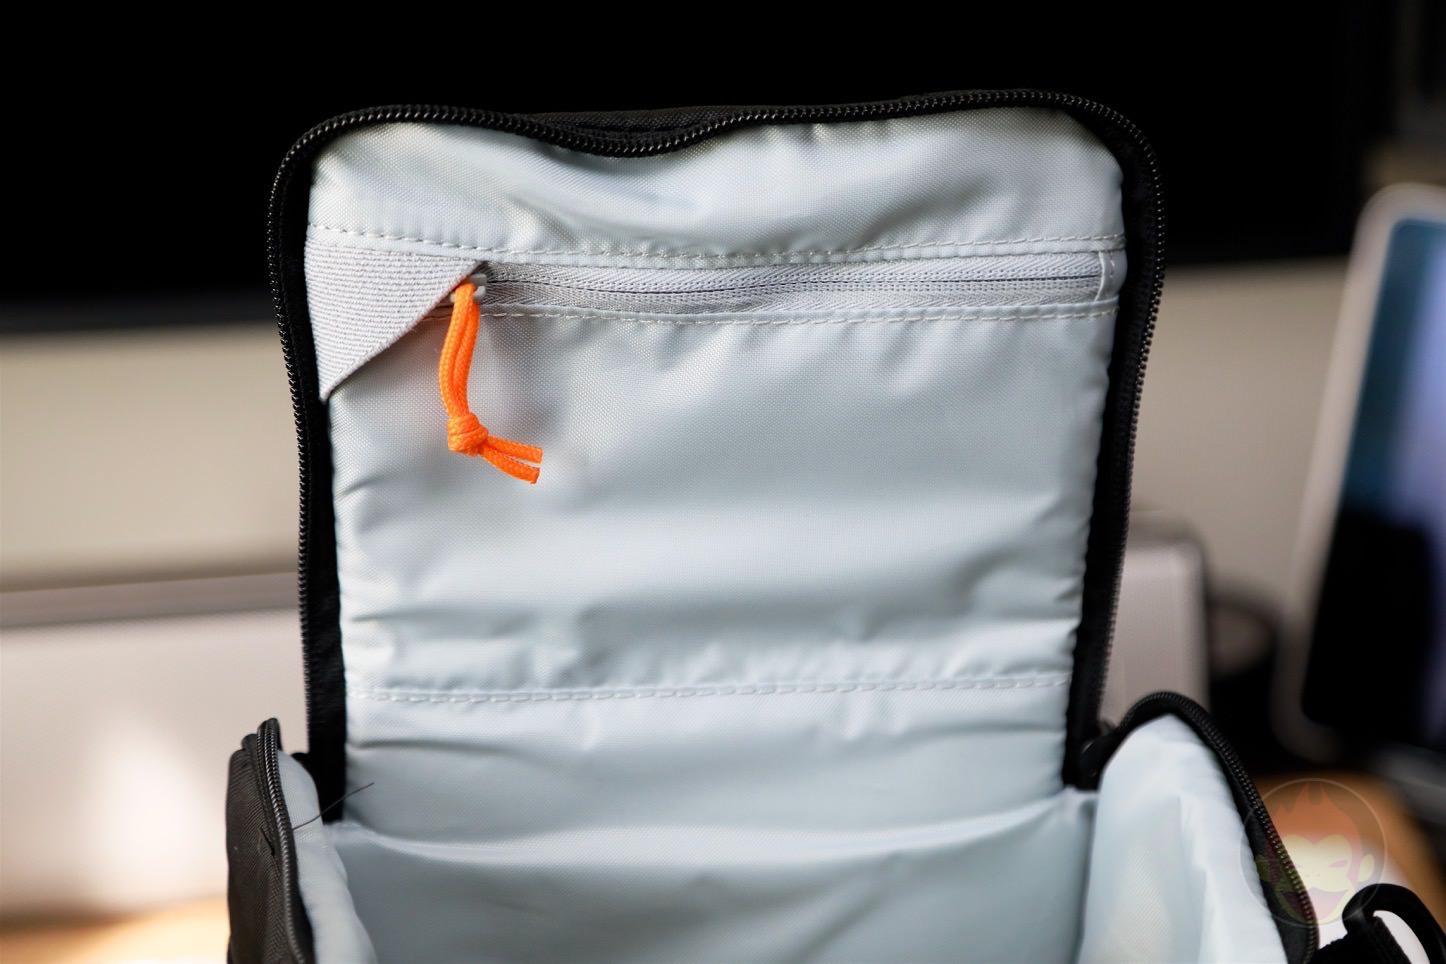 Lowepro-Camera-bag-Toploader-Zoom-AW2-03.jpg